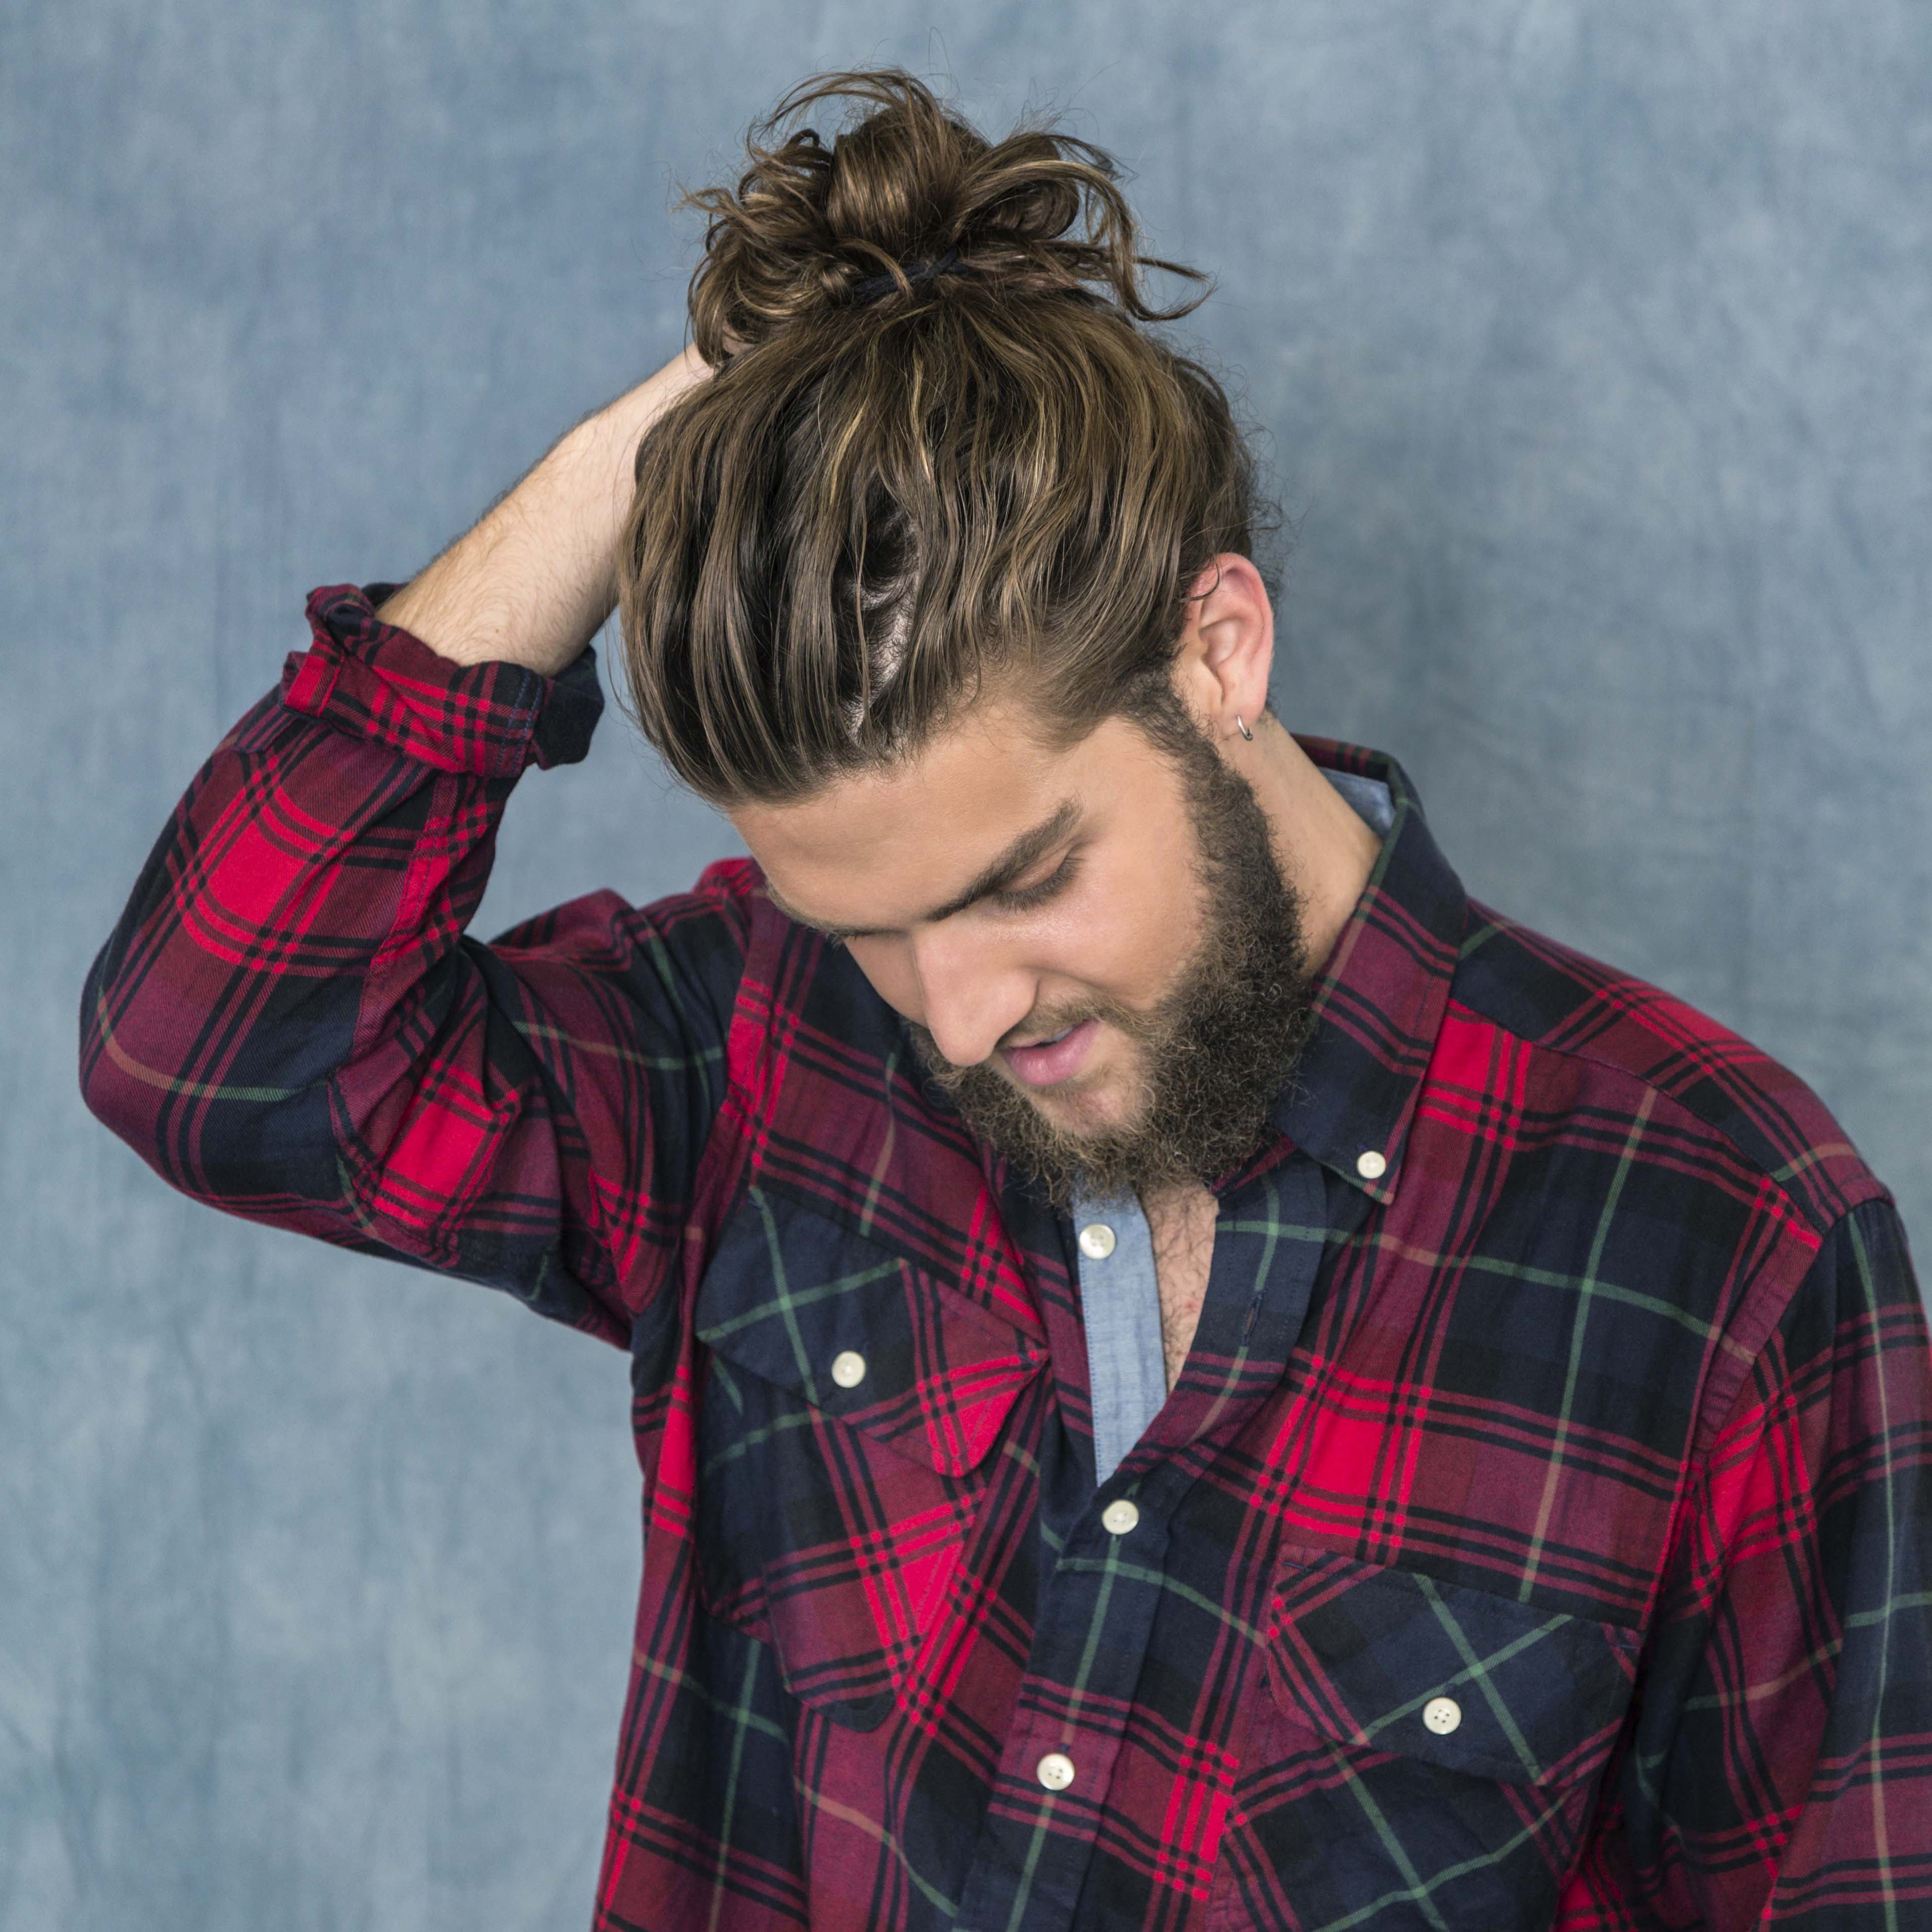 Pleasing Best Haircuts For Men Losing Hair Haircut Today Natural Hairstyles Runnerswayorg